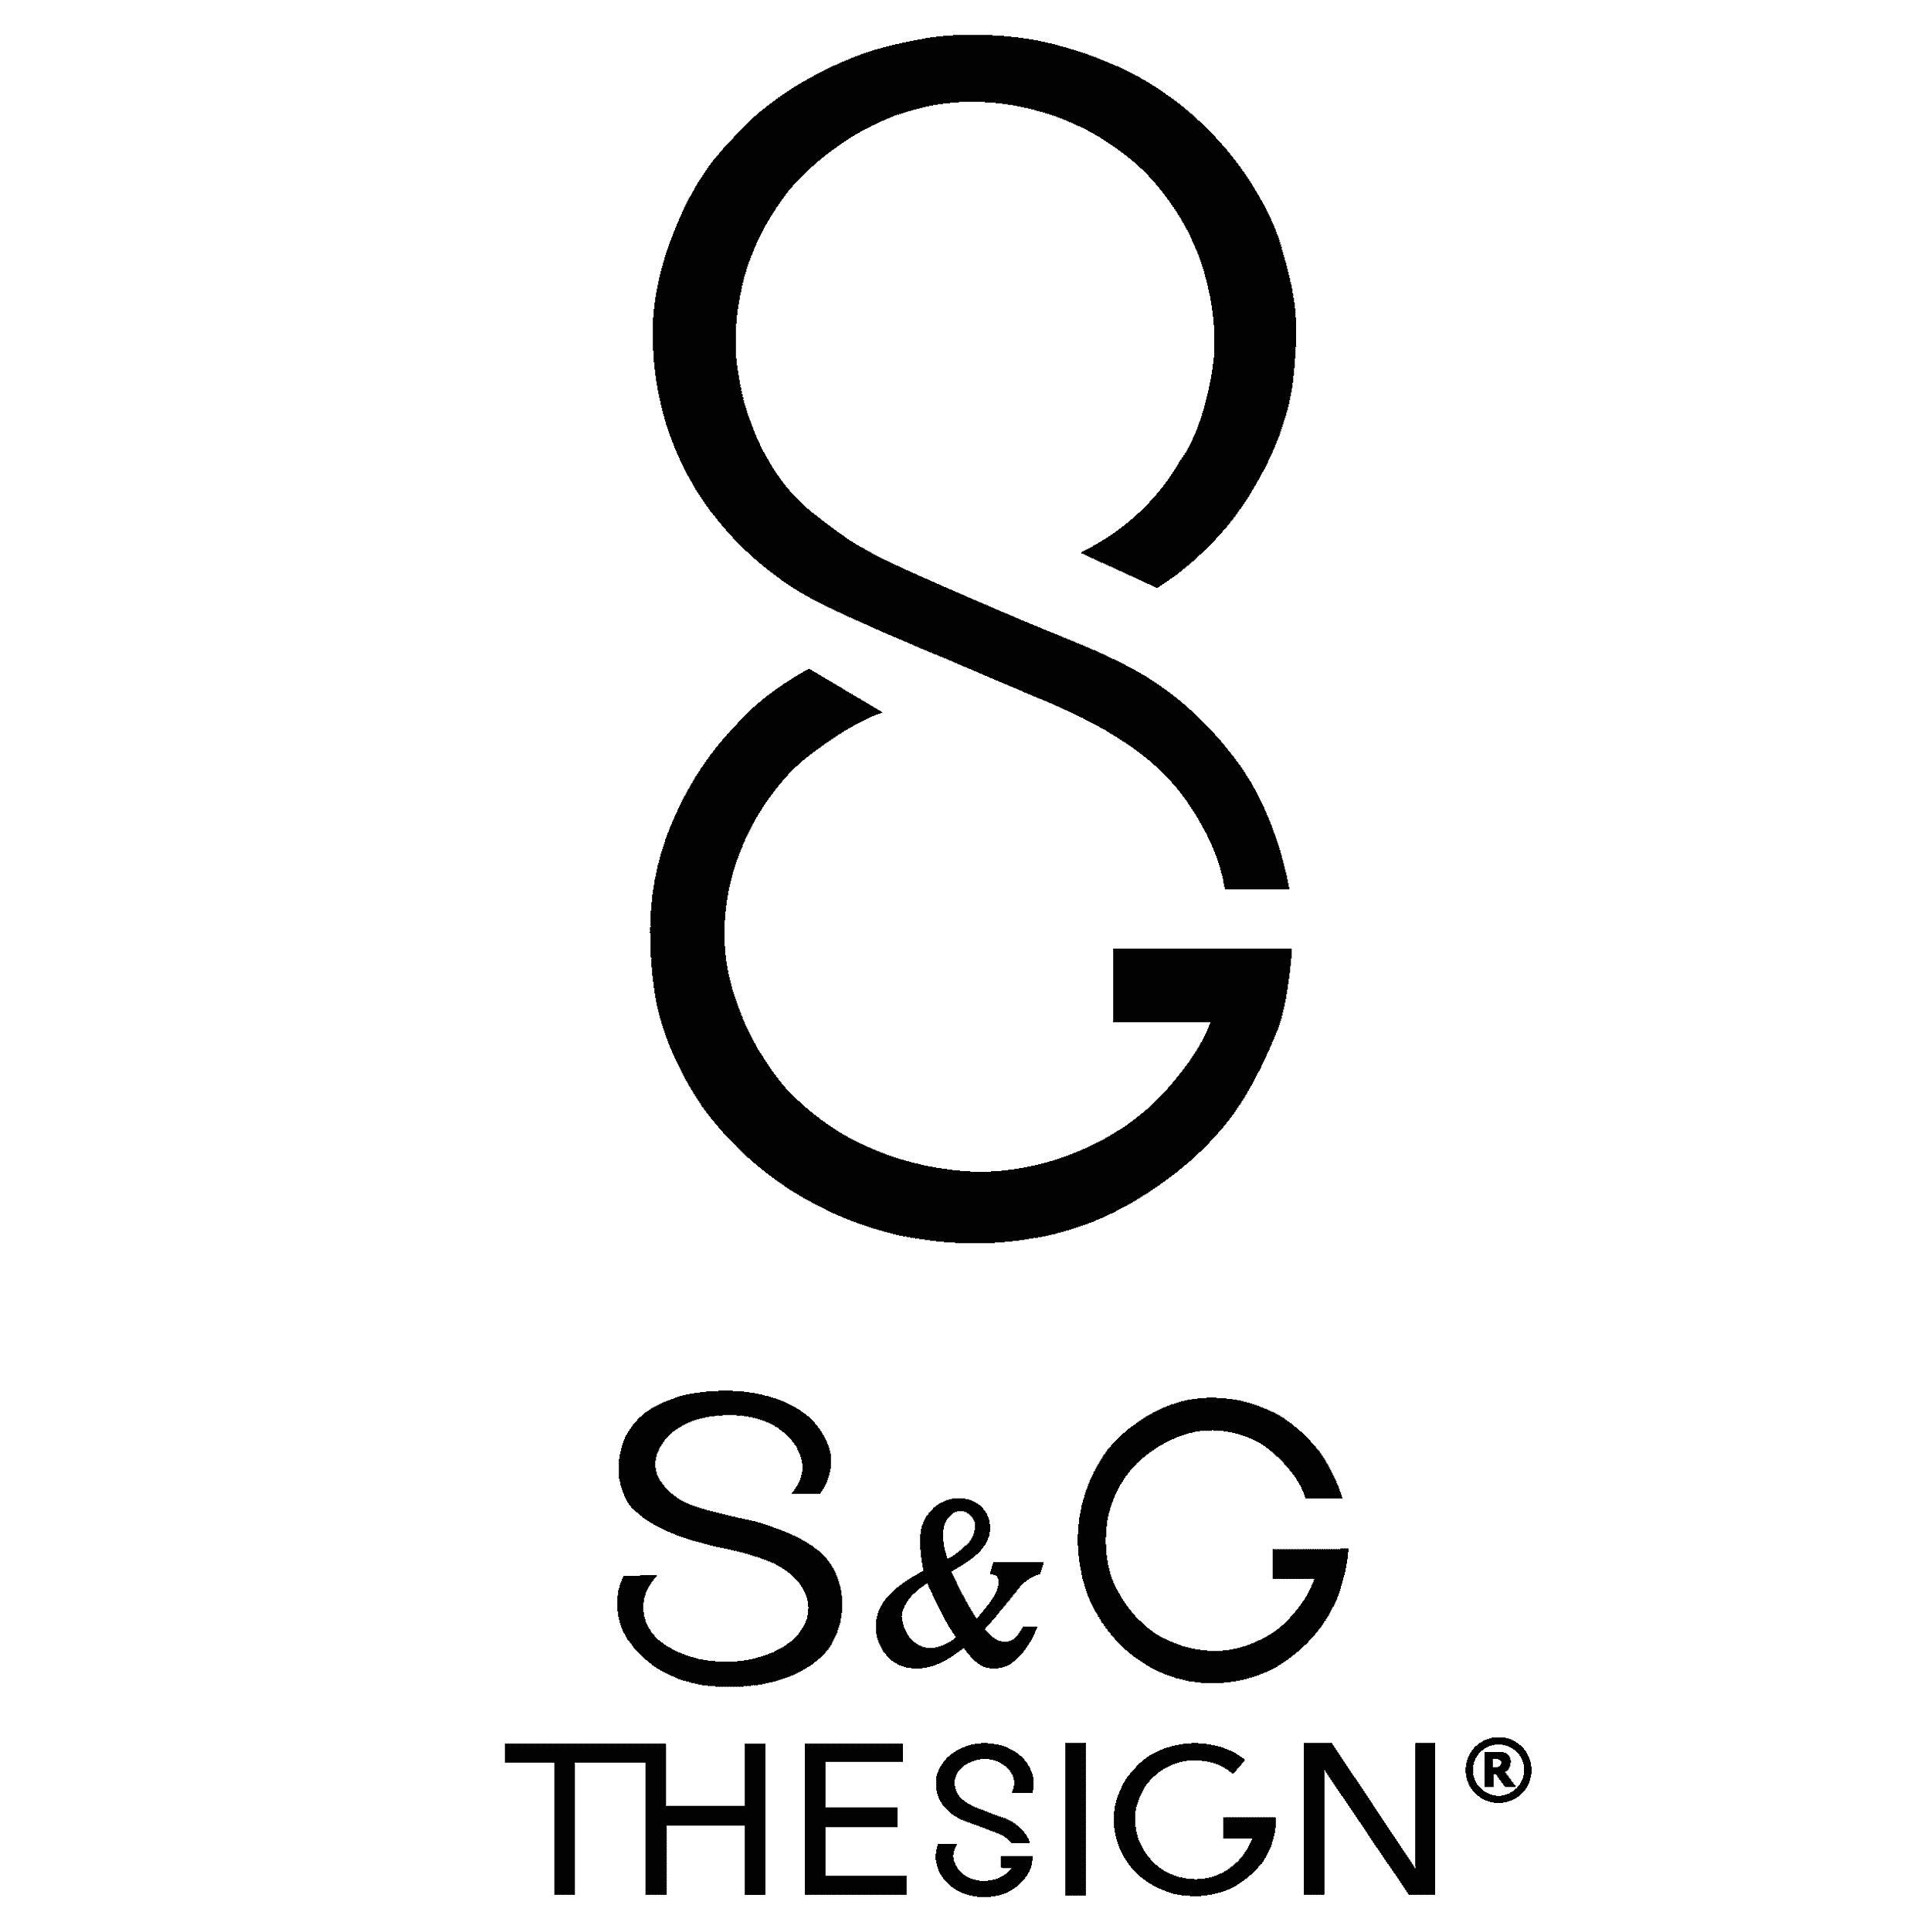 S&G Thesign